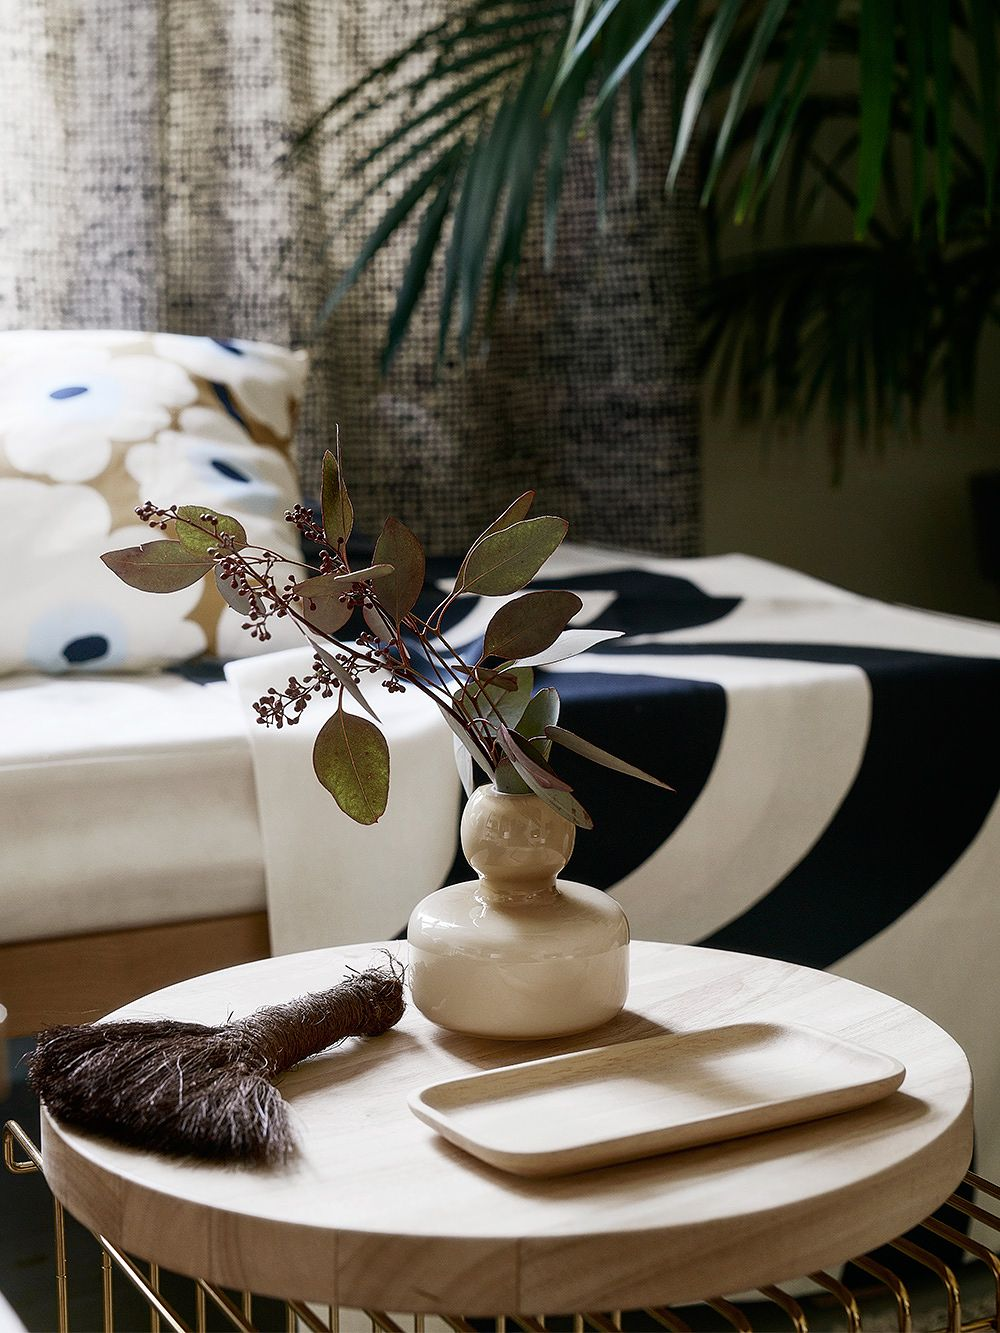 Marimekko's Flower vase